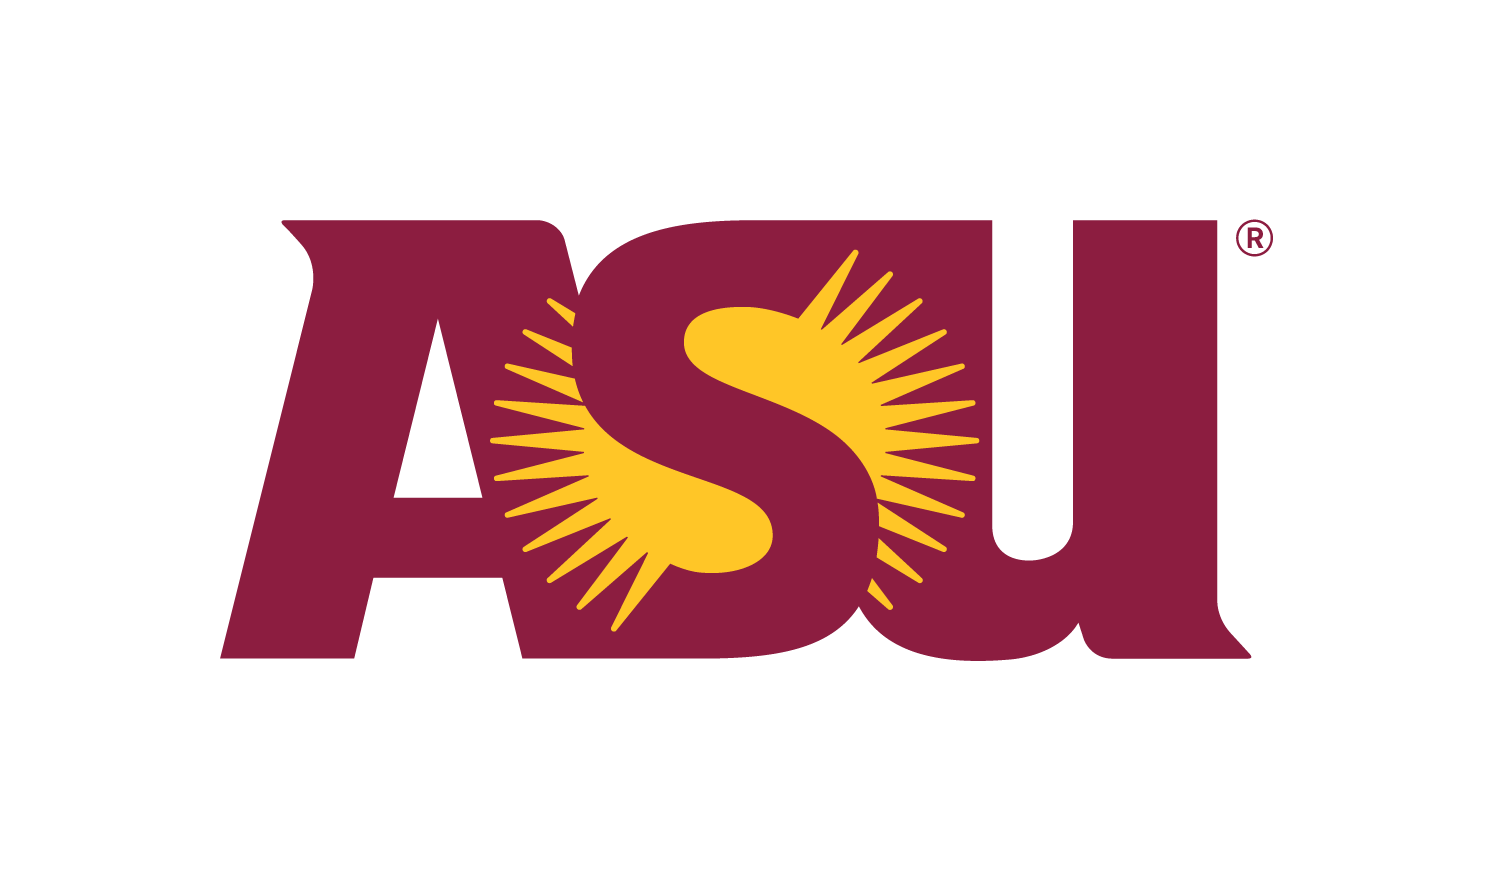 ASU sunburst logo